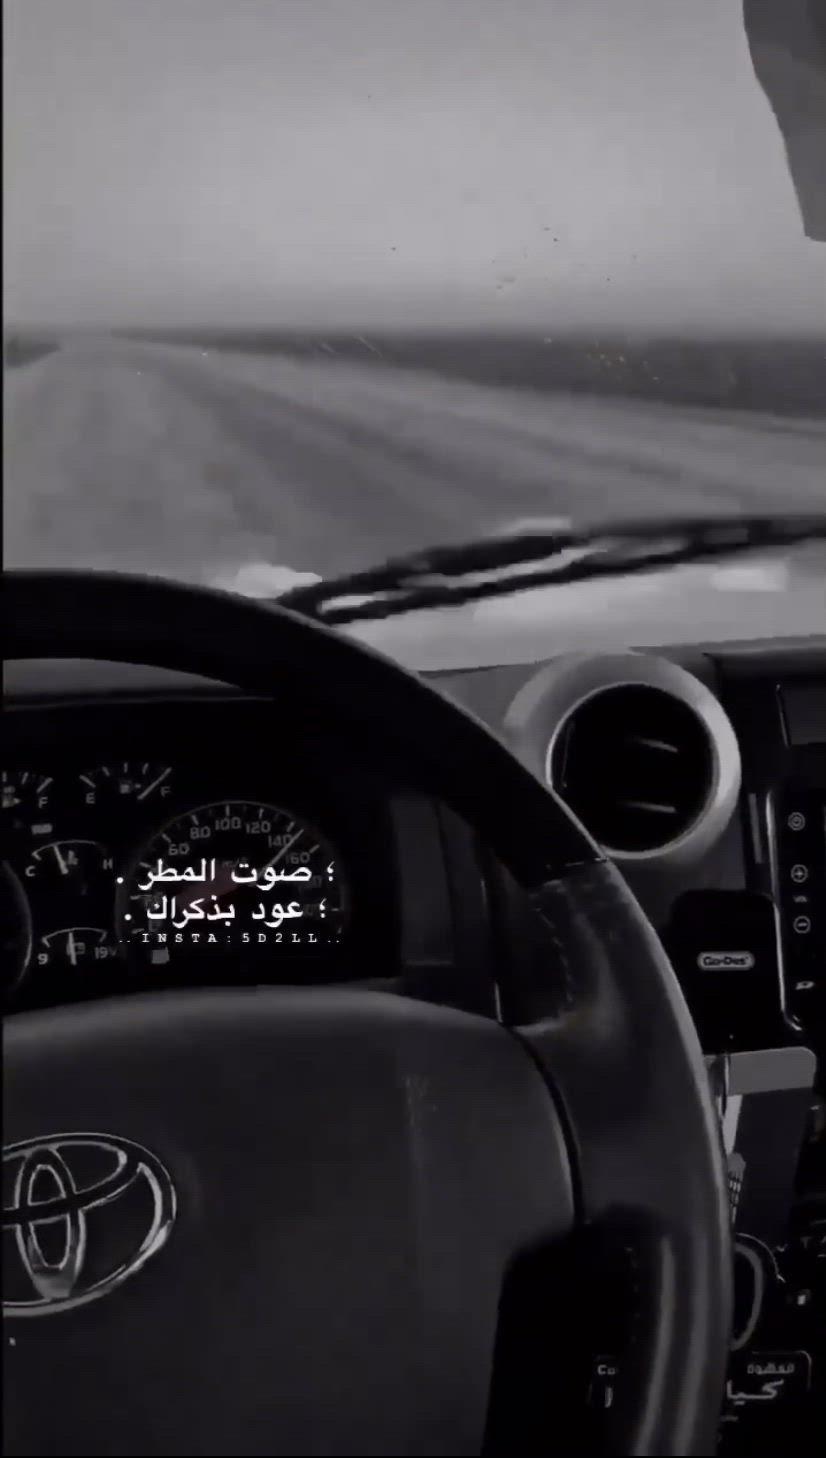 صصوت المطر عوود بذكراكك Video Cute Relationship Texts Iphone Wallpaper Quotes Love Beautiful Arabic Words